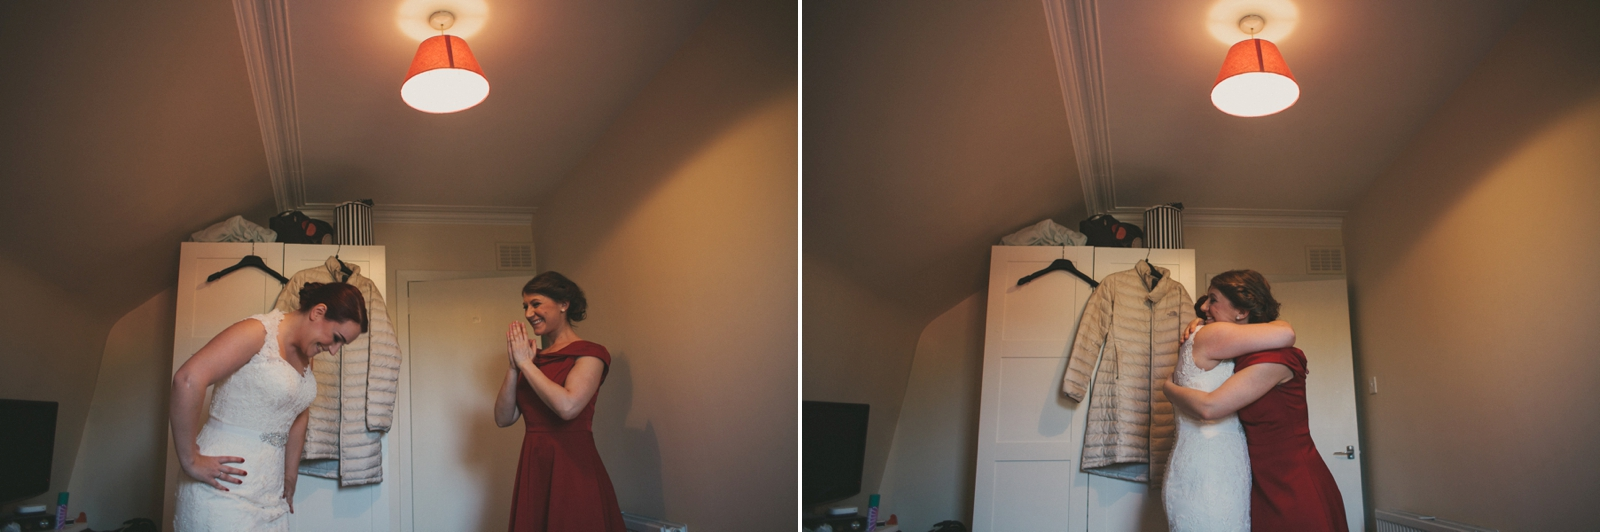 Emma+Ali-Wedding-069.jpg